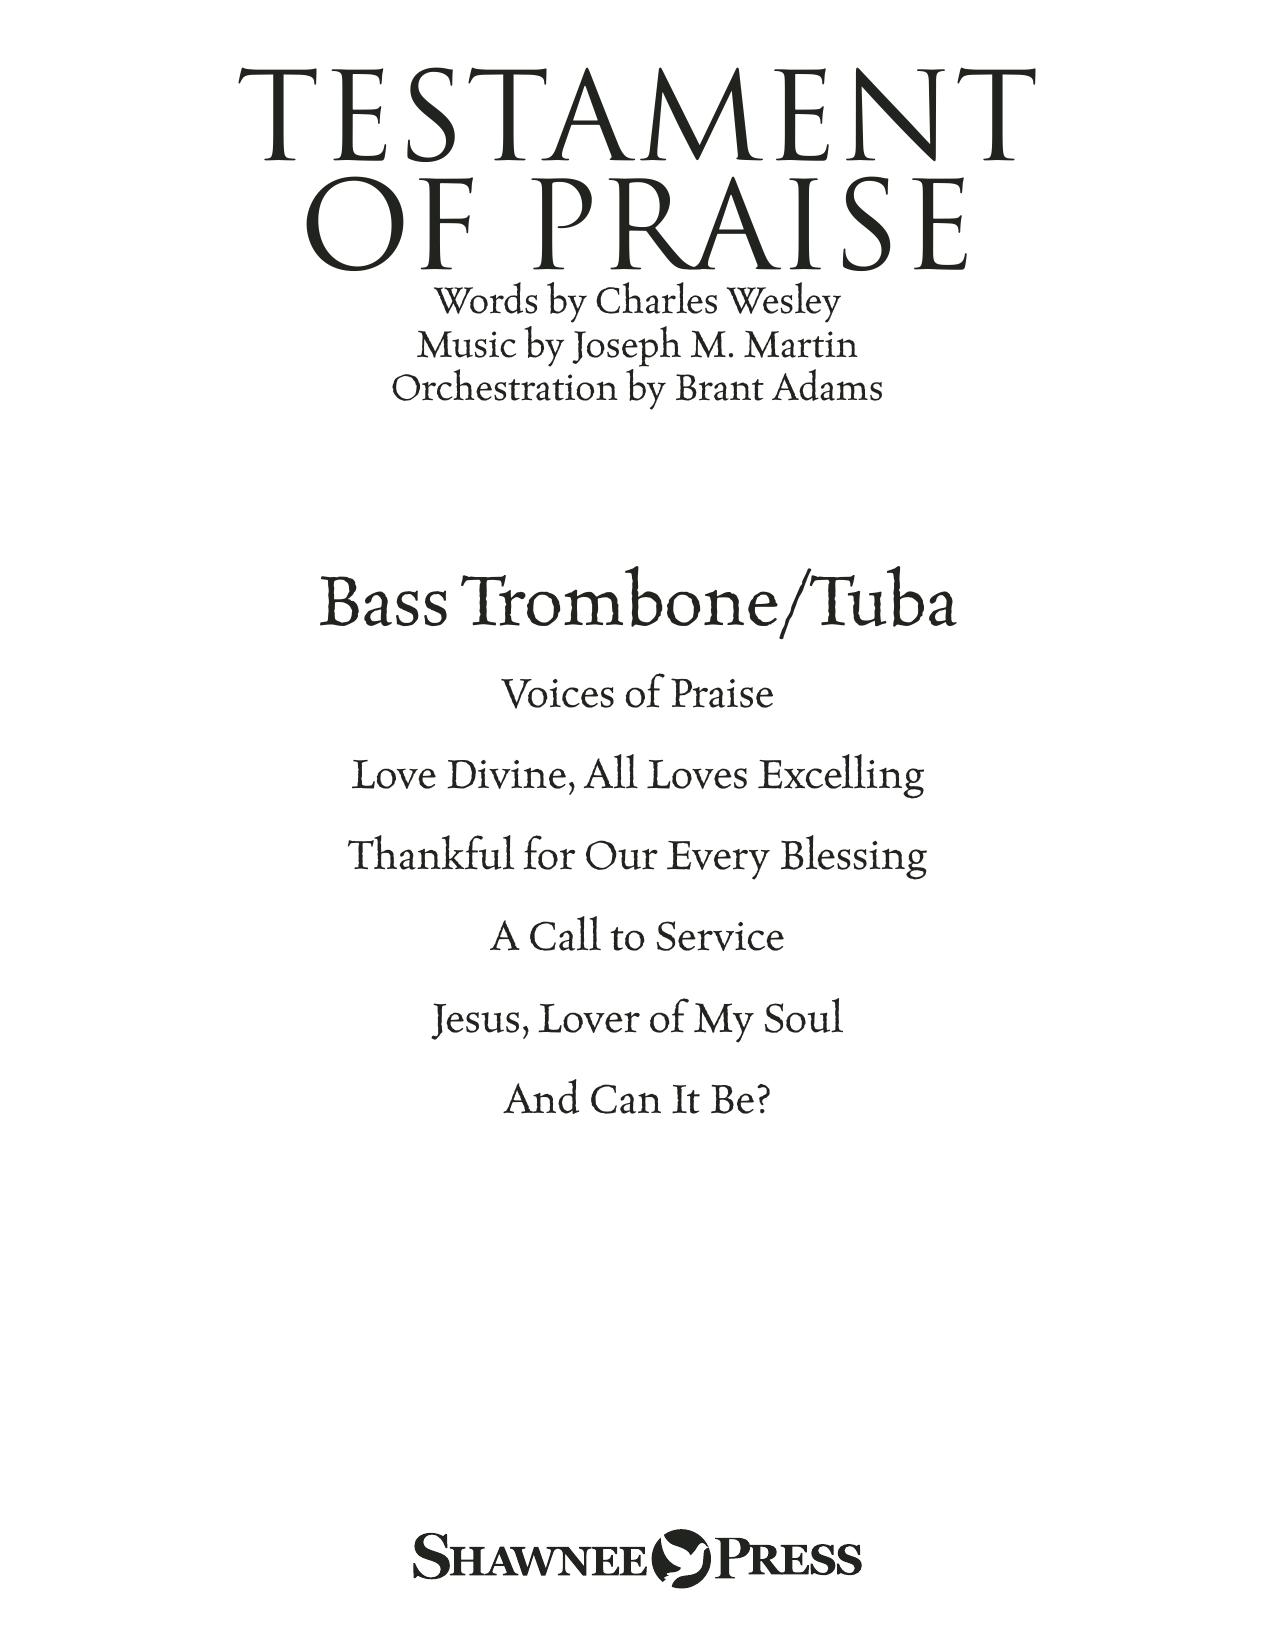 Joseph M. Martin Testament of Praise (A Celebration of Faith) - Bass Trombone/Tuba sheet music notes and chords. Download Printable PDF.